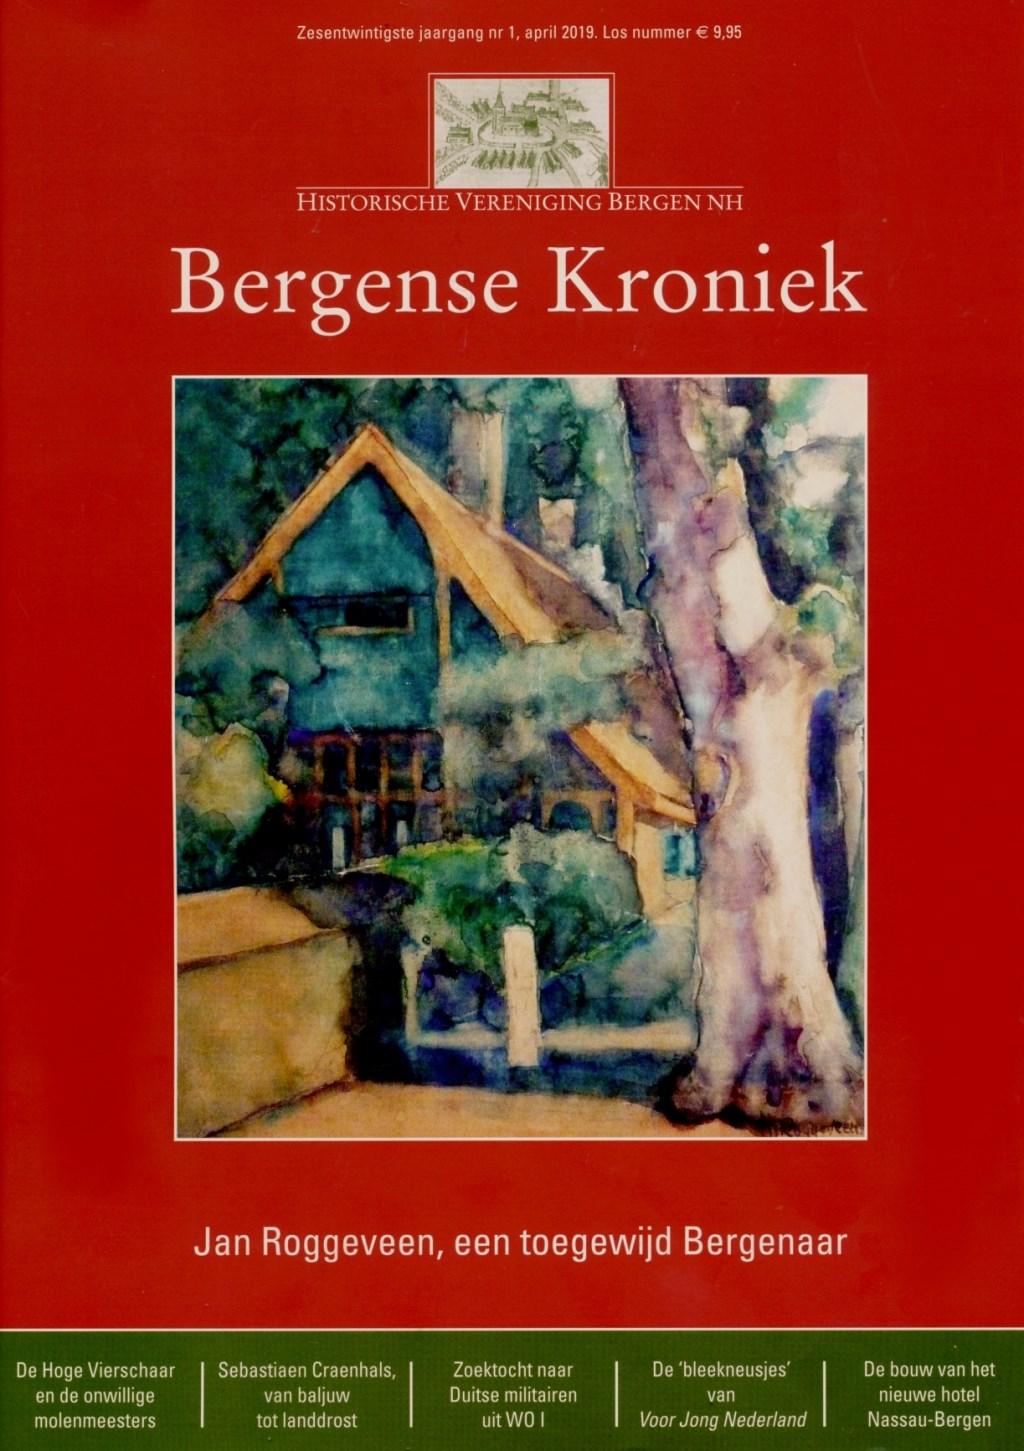 De Bergense Kroniek. (Foto: Artmaster/Peter Homan) © rodi